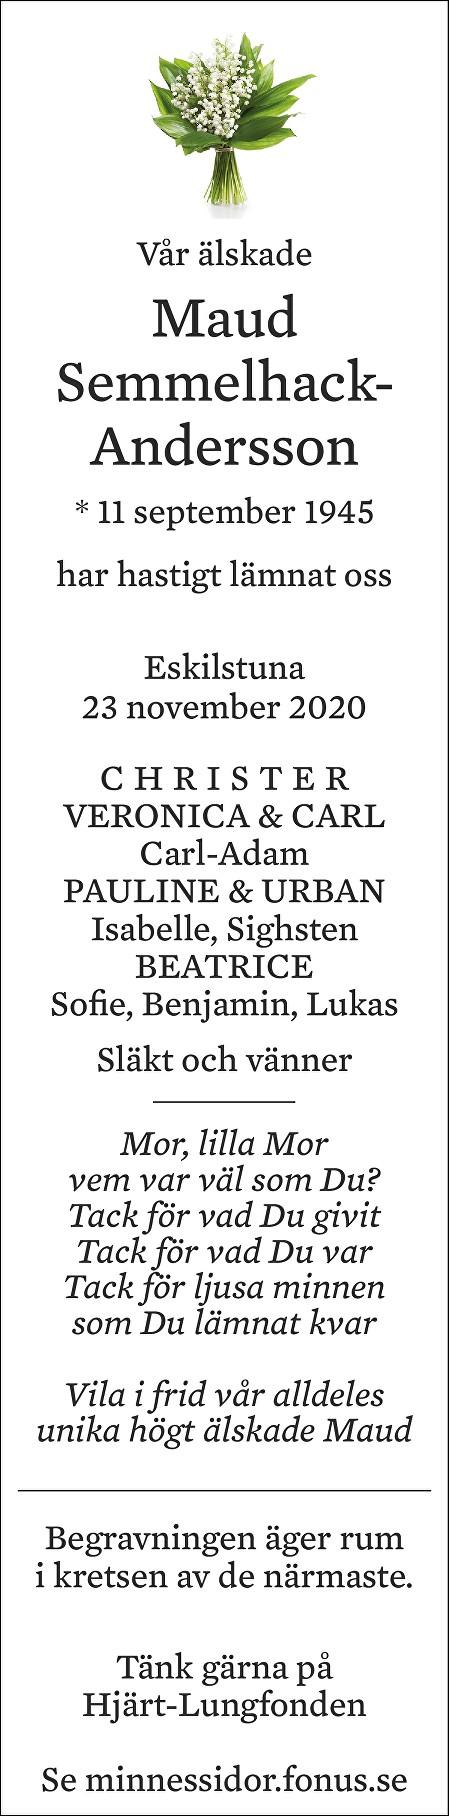 Maud Semmelhack-Andersson Death notice